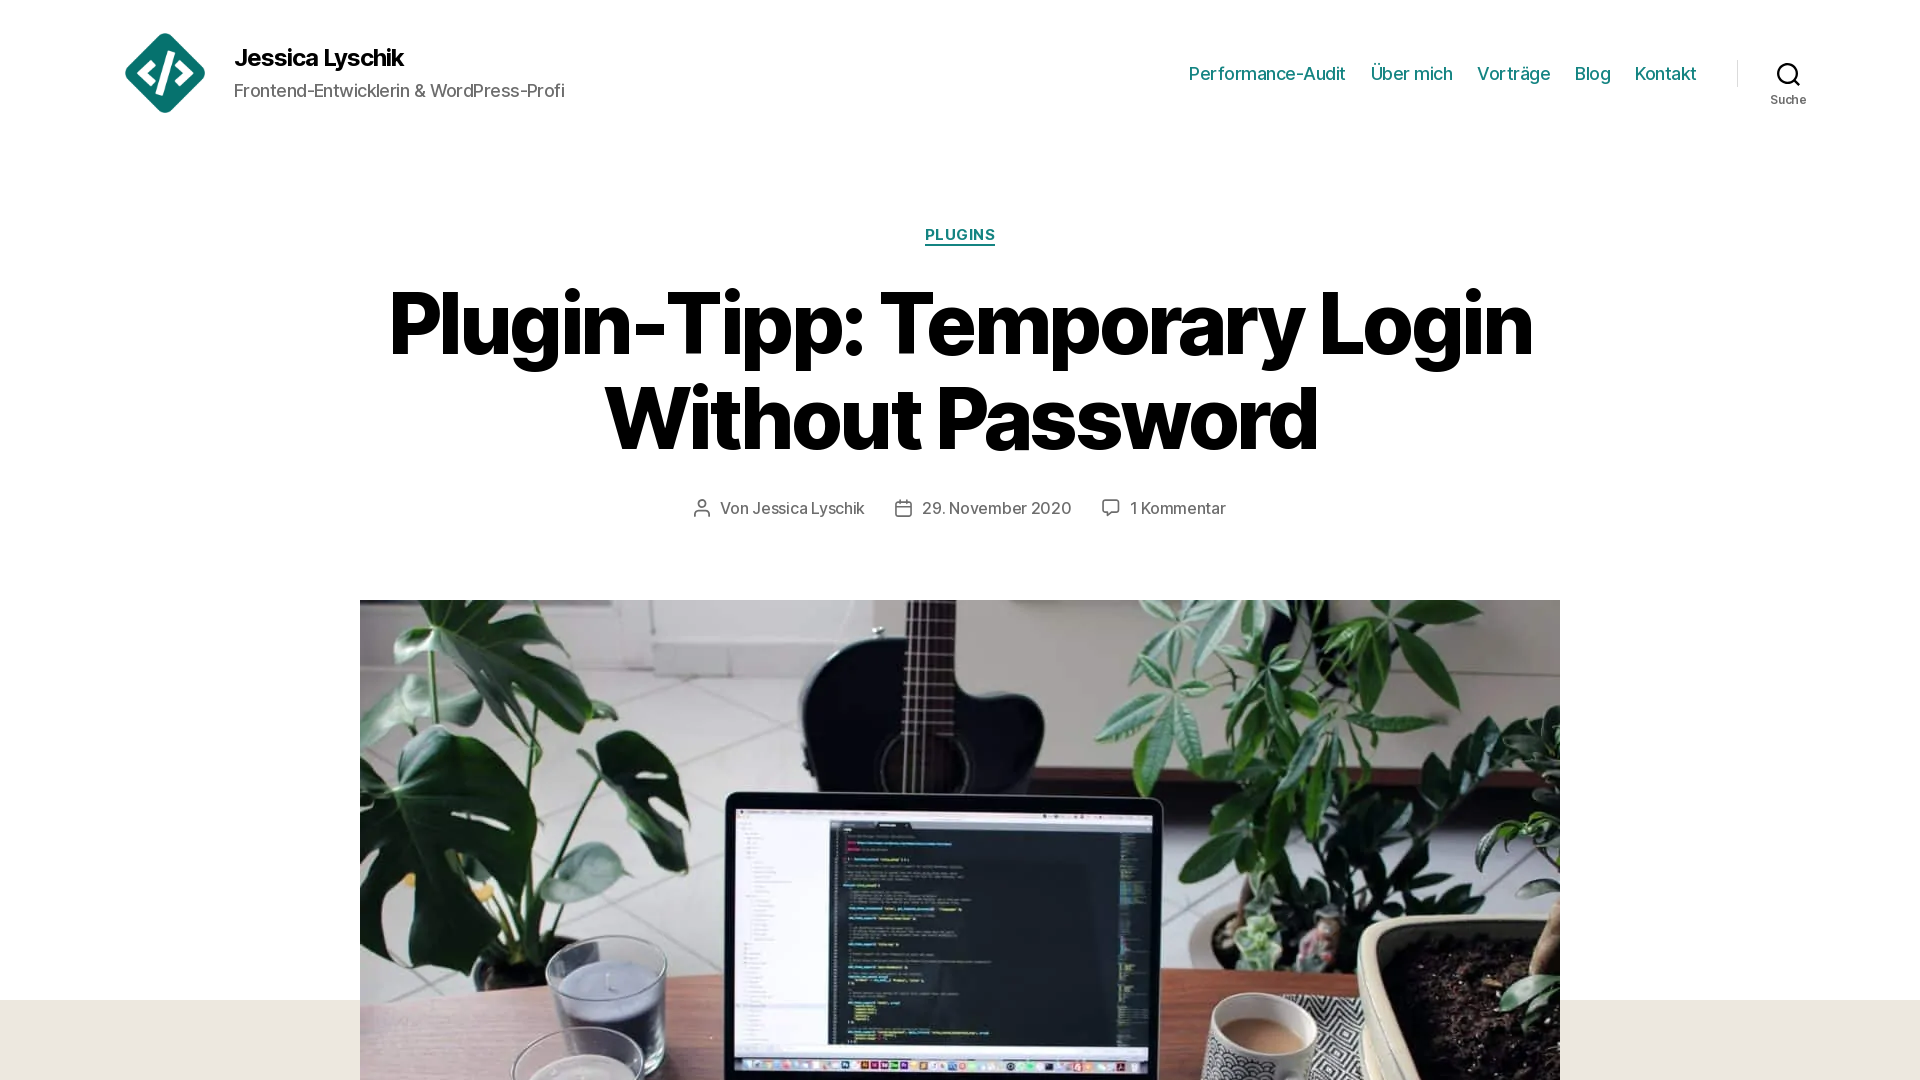 https://jessicalyschik.de/plugin-tipp-temporary-login-without-password/